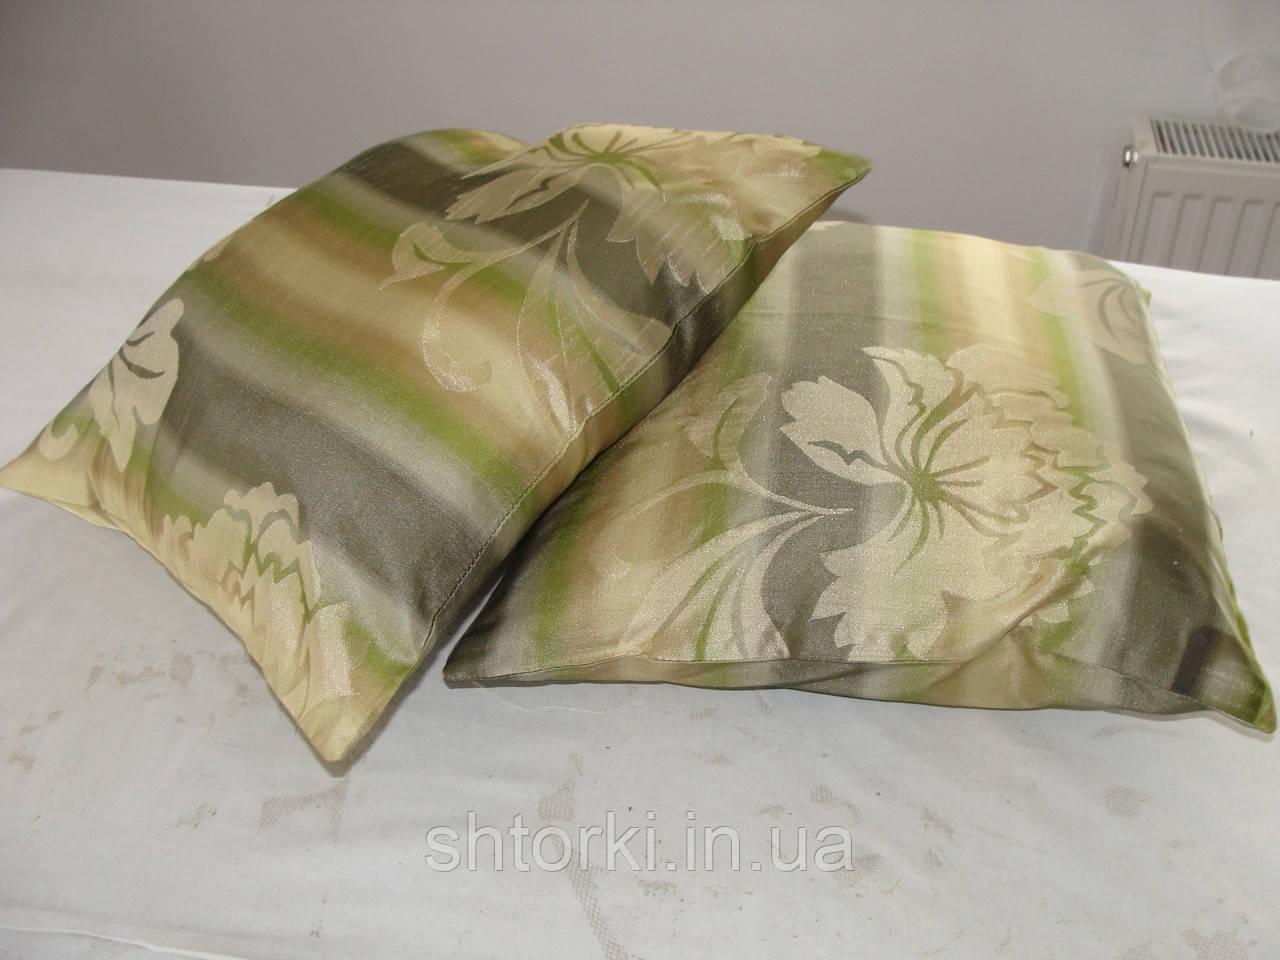 Комплект подушек  С цветами беж , 2 шт 35х35